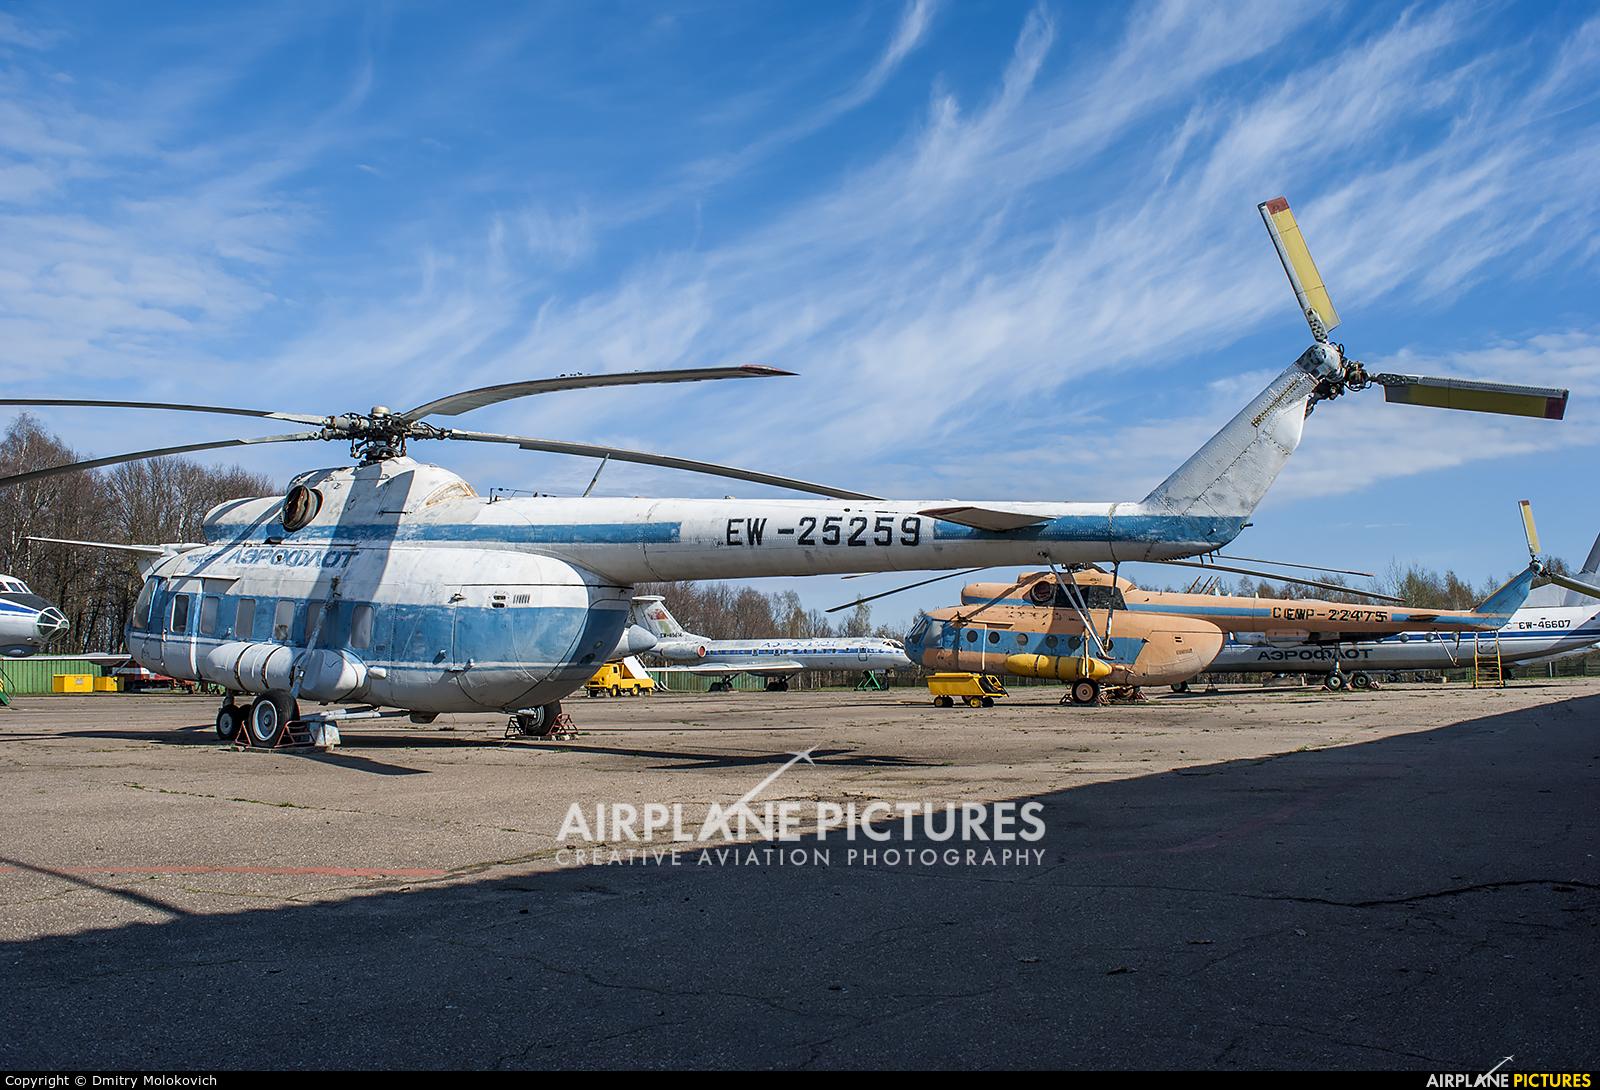 Aeroflot EW-25259 aircraft at Undisclosed Location